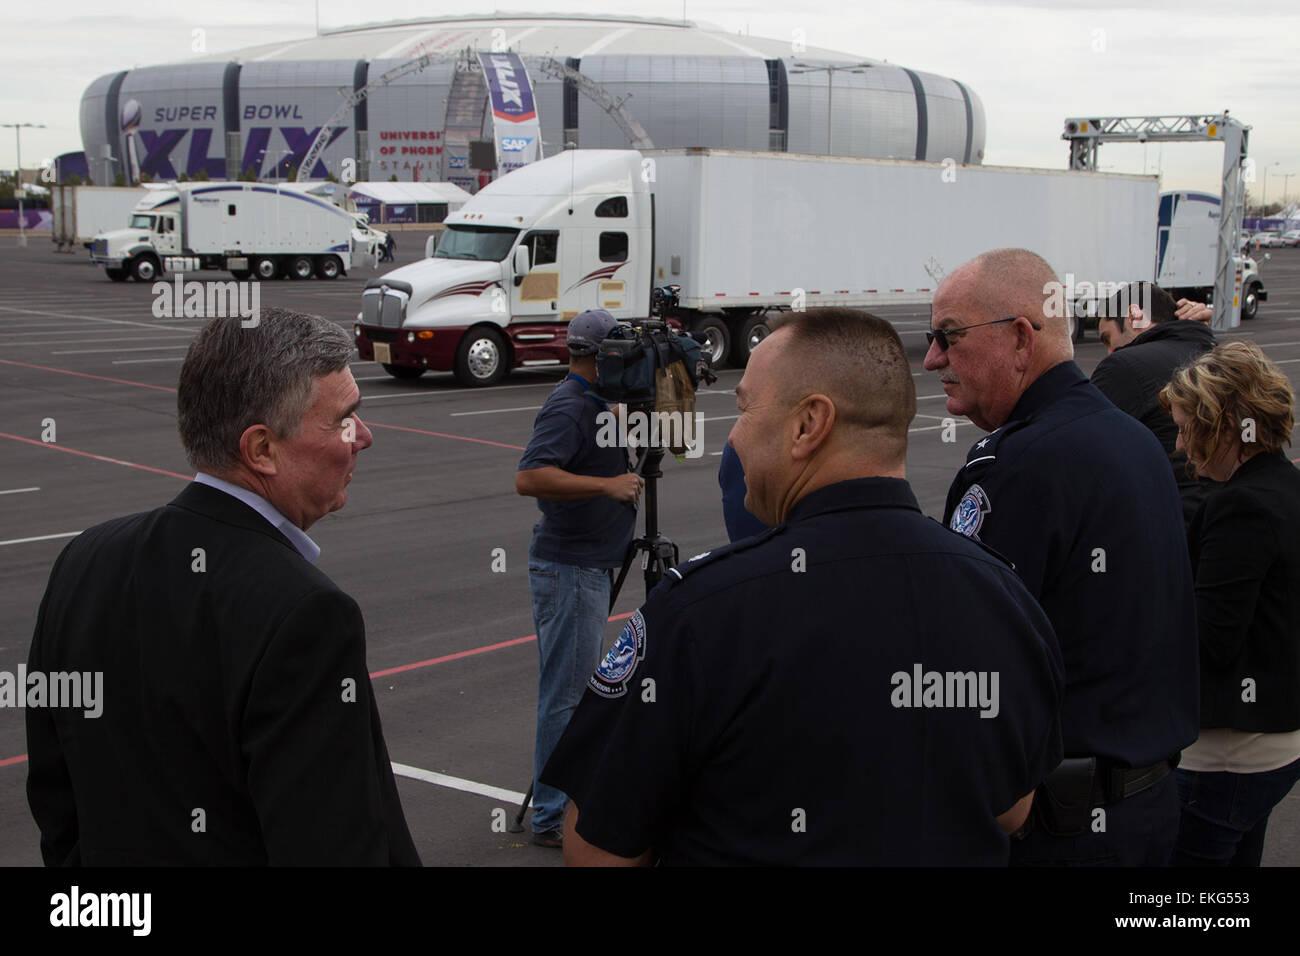 012615:CBP background support during Super Bowl XLIX.  CBP Commissioner Kerlikowske at the CBP Non Intrusion Inspection - Stock Image